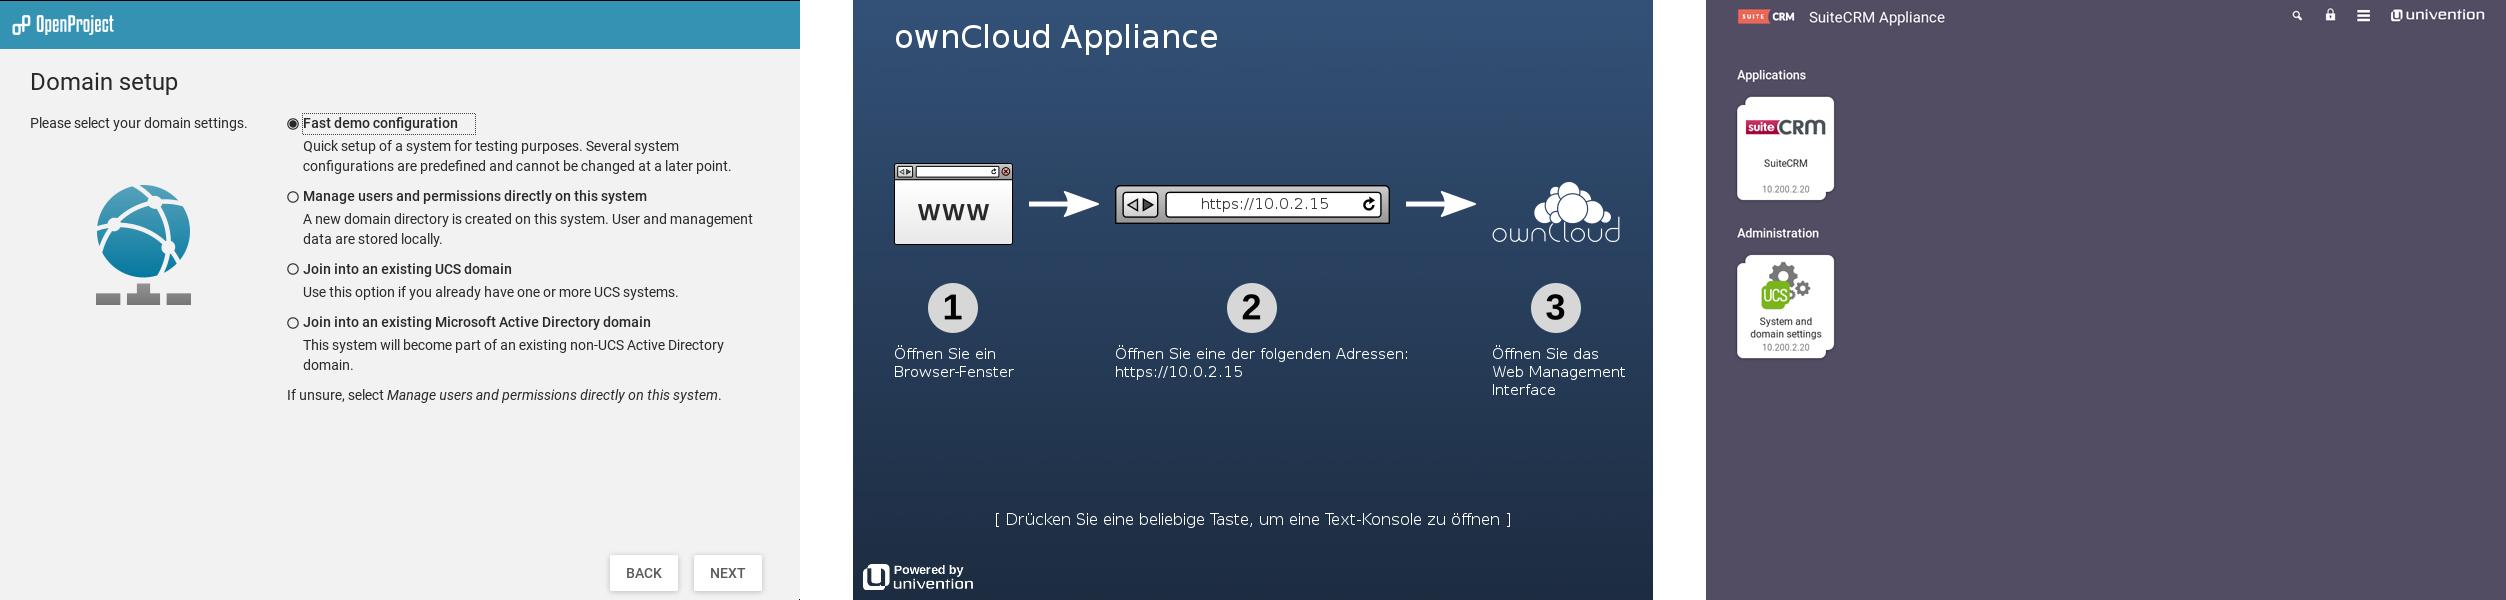 Ready to use: Nextcloud, ownCloud, Kopano App Appliances Univention